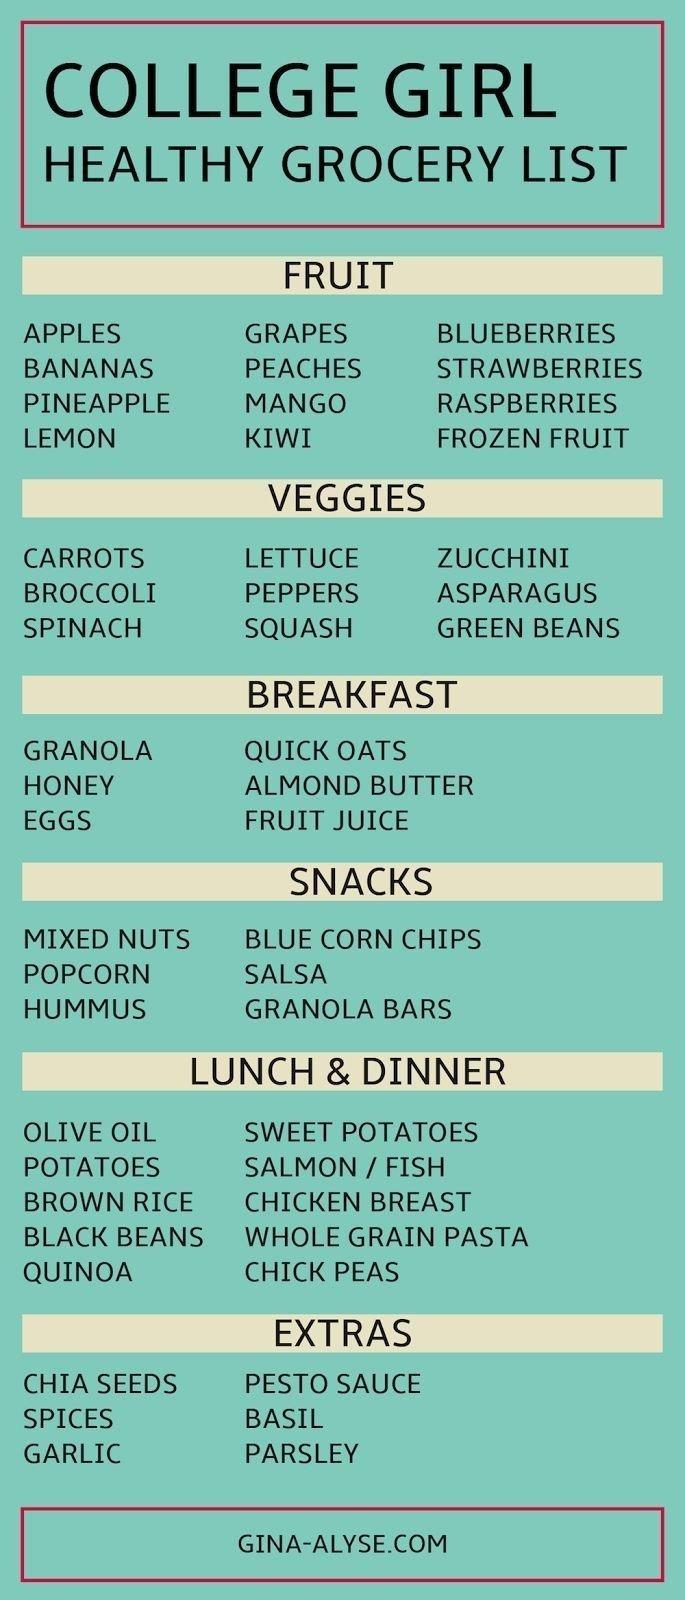 10 Trendy List Of Easy Dinner Ideas healthy college girl grocery list breakfast lunch dinner college 2020